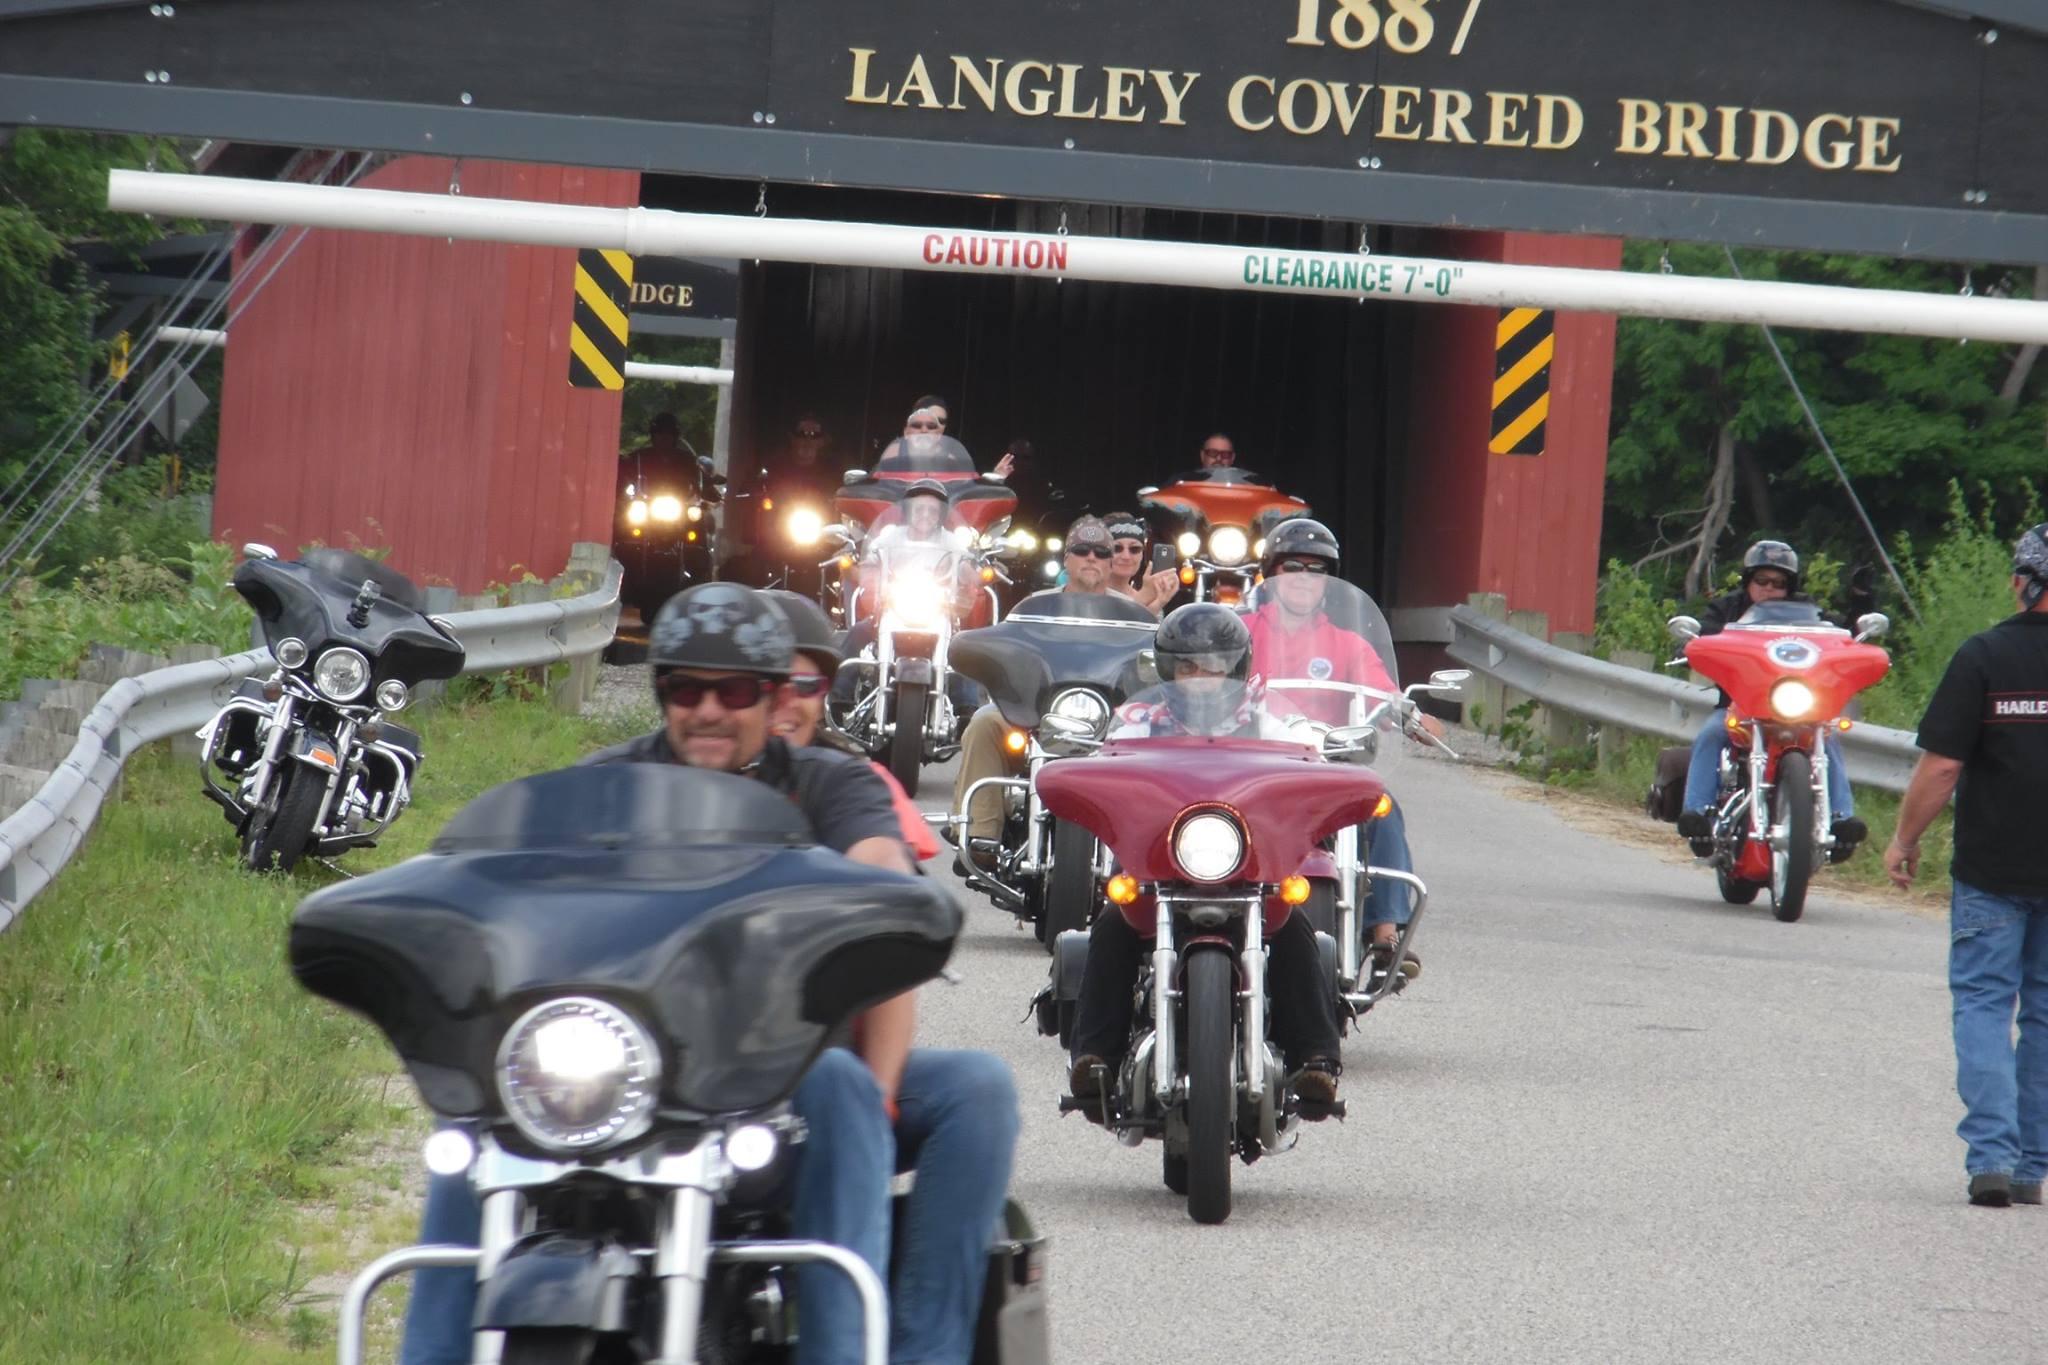 red-arrow-ride-covered-bridge